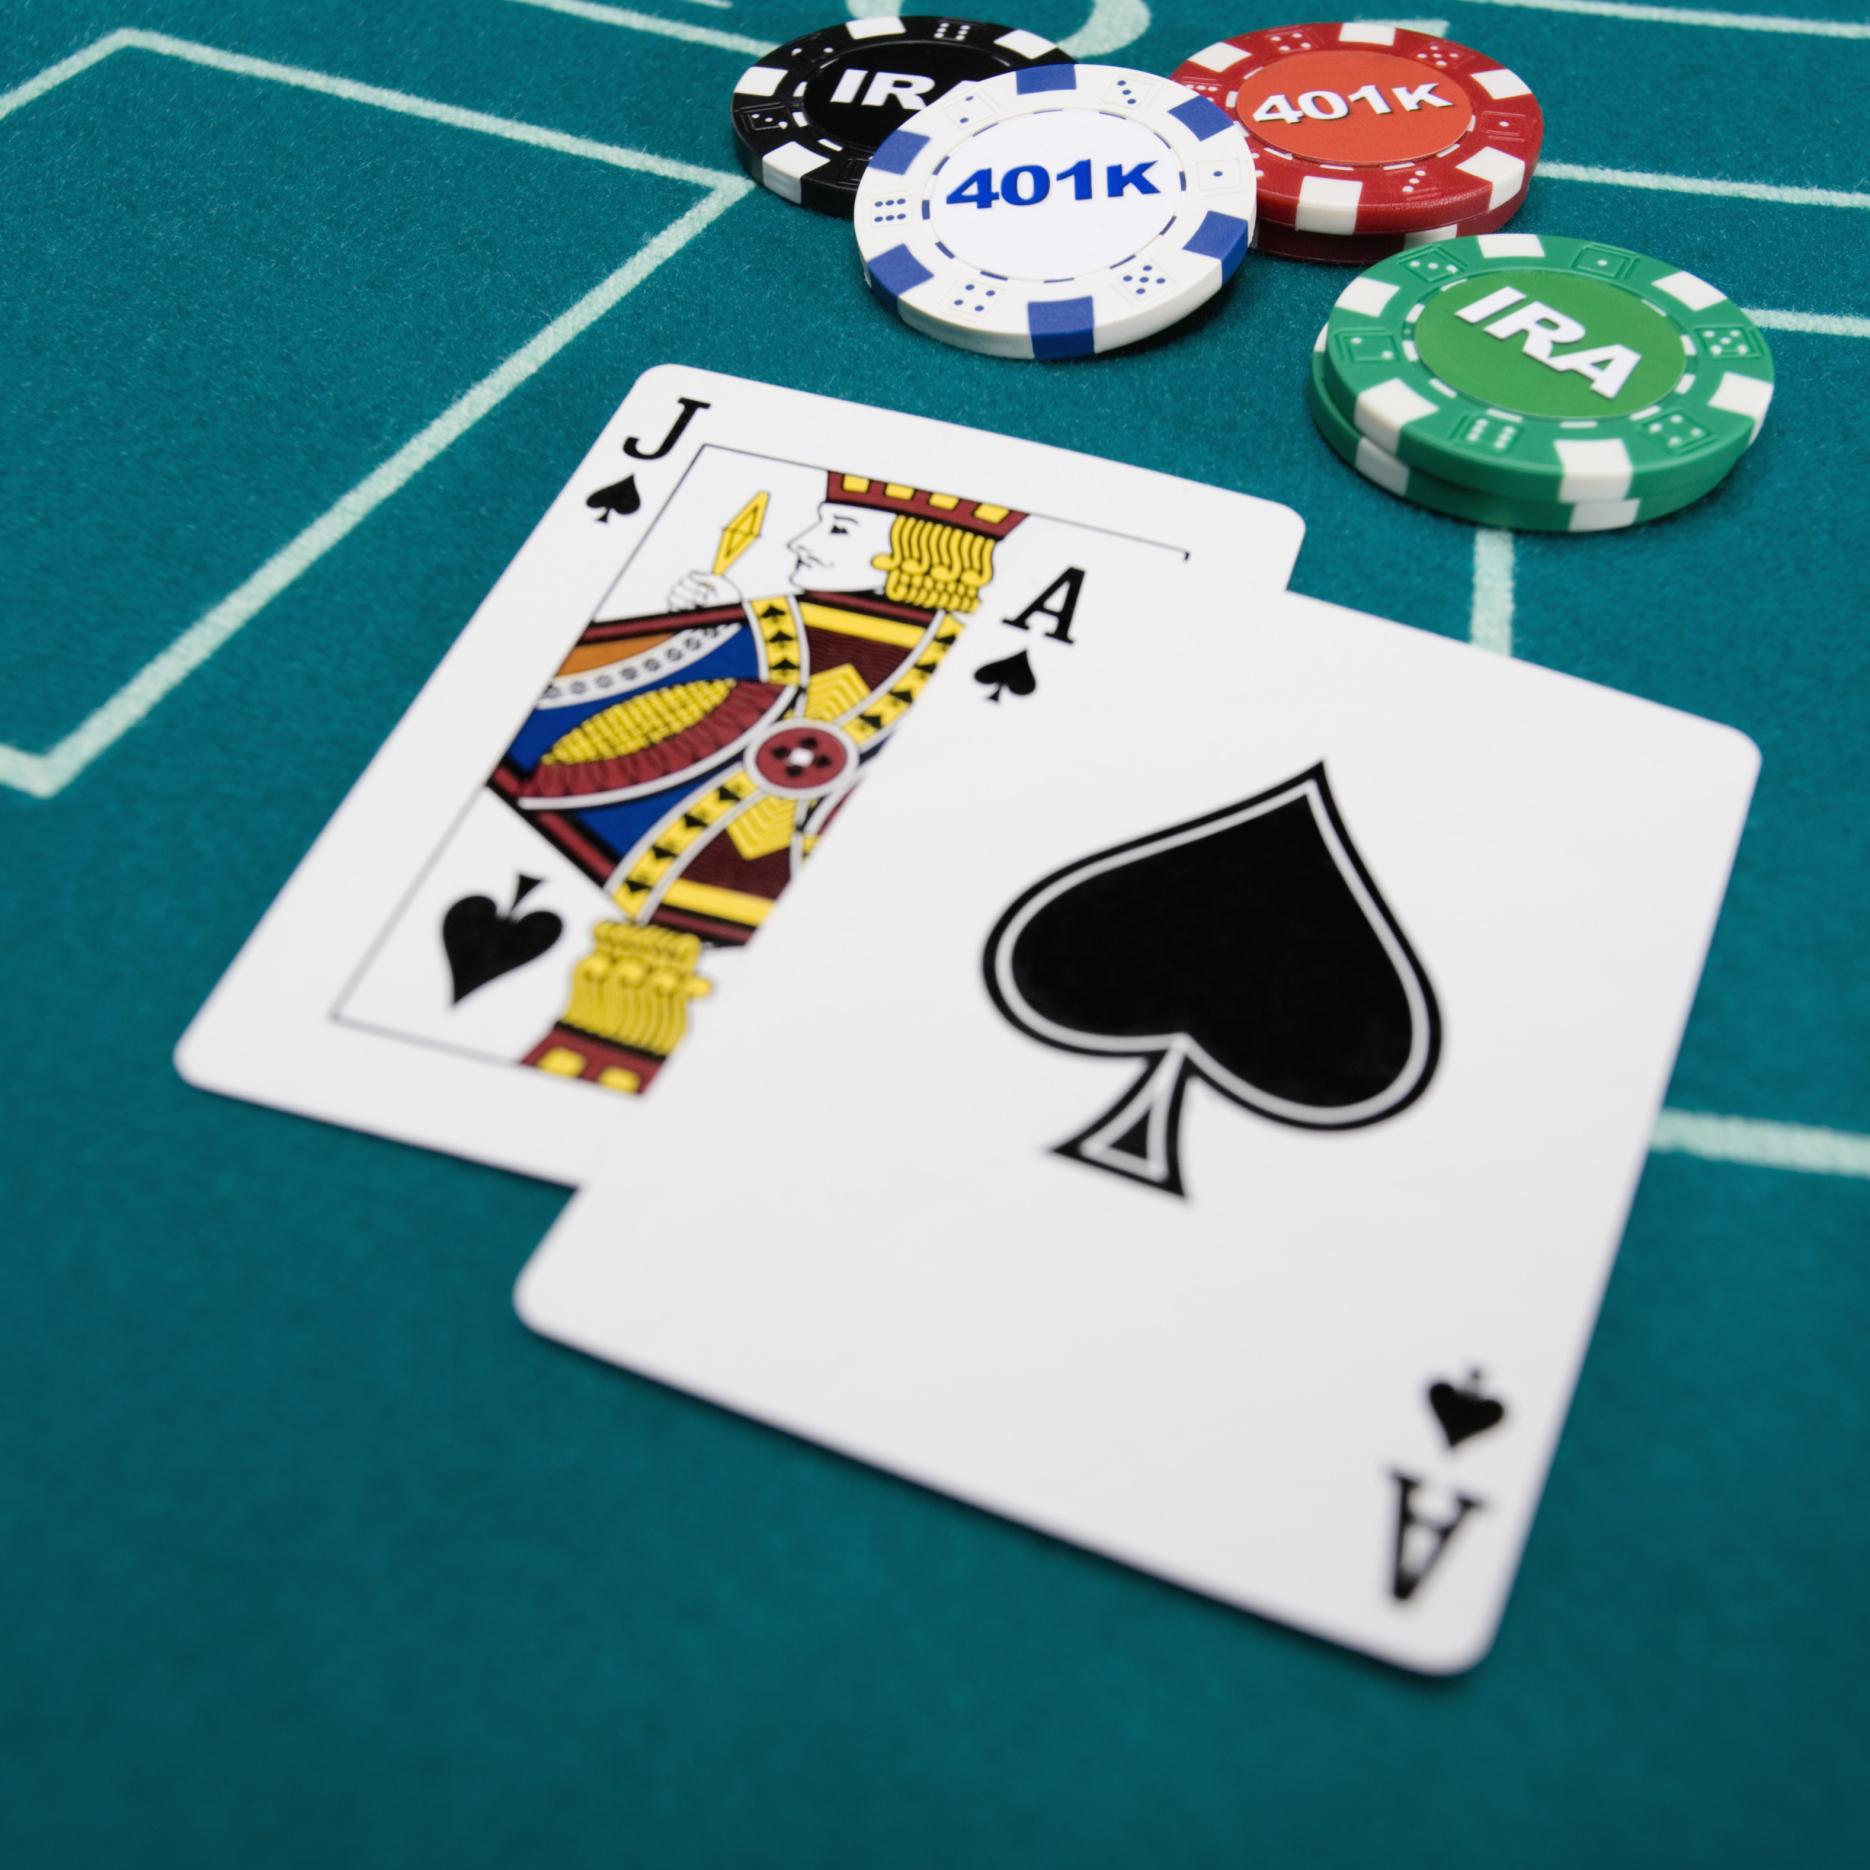 blackjack-5.jpg